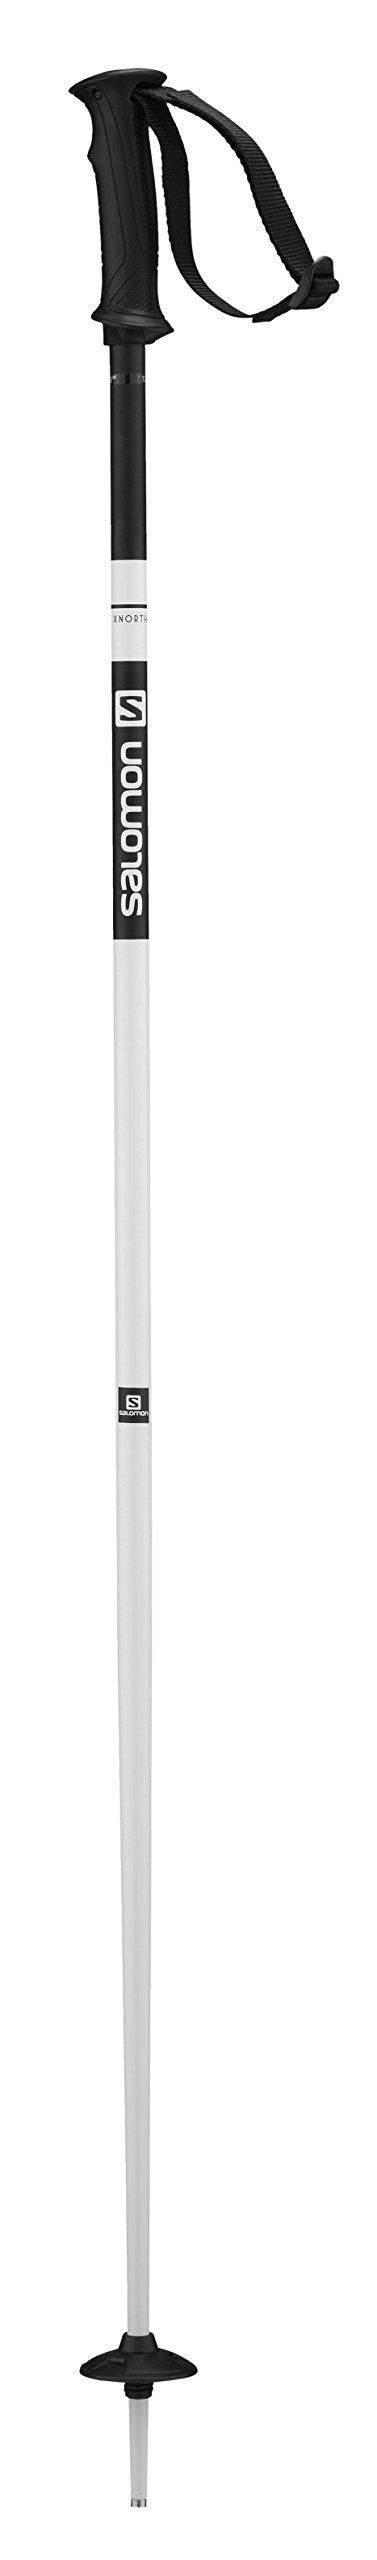 Salomon x North, 130, White by SALOMON